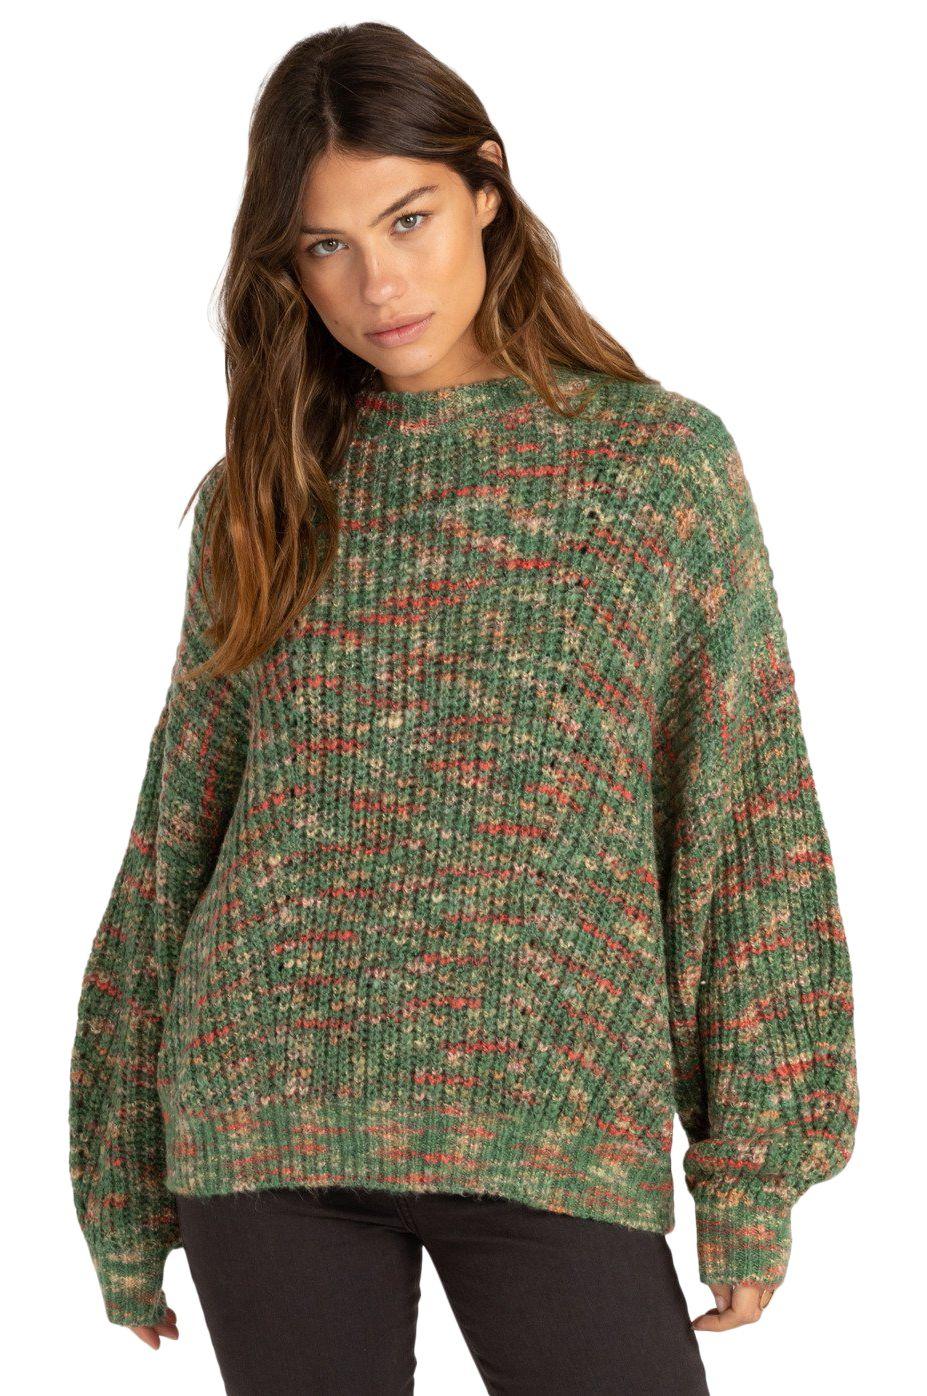 Billabong Sweater THROUGH THE JUNGLE PARADISE FOUND Multi